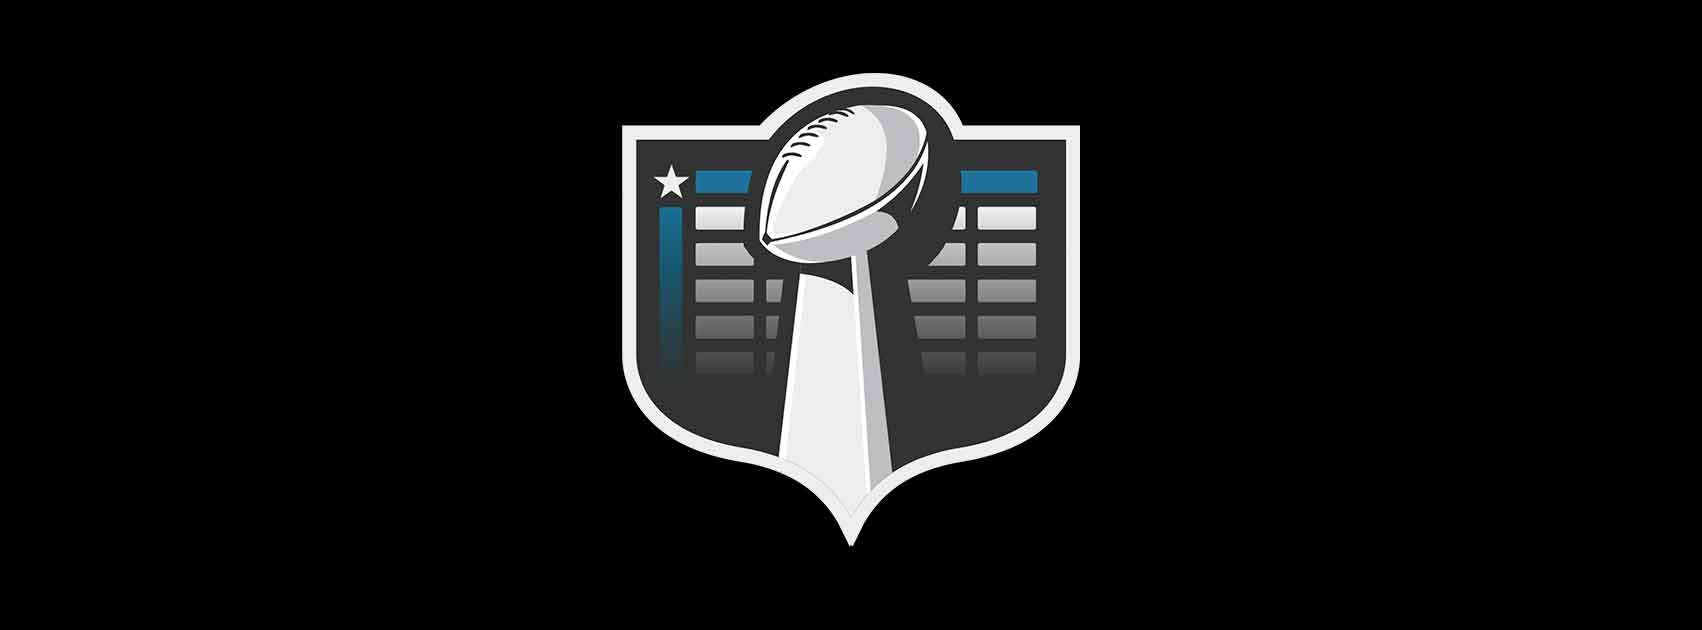 Super Bowl <b>Pool</b> Site: Free Online Super Bowl Squares Contests